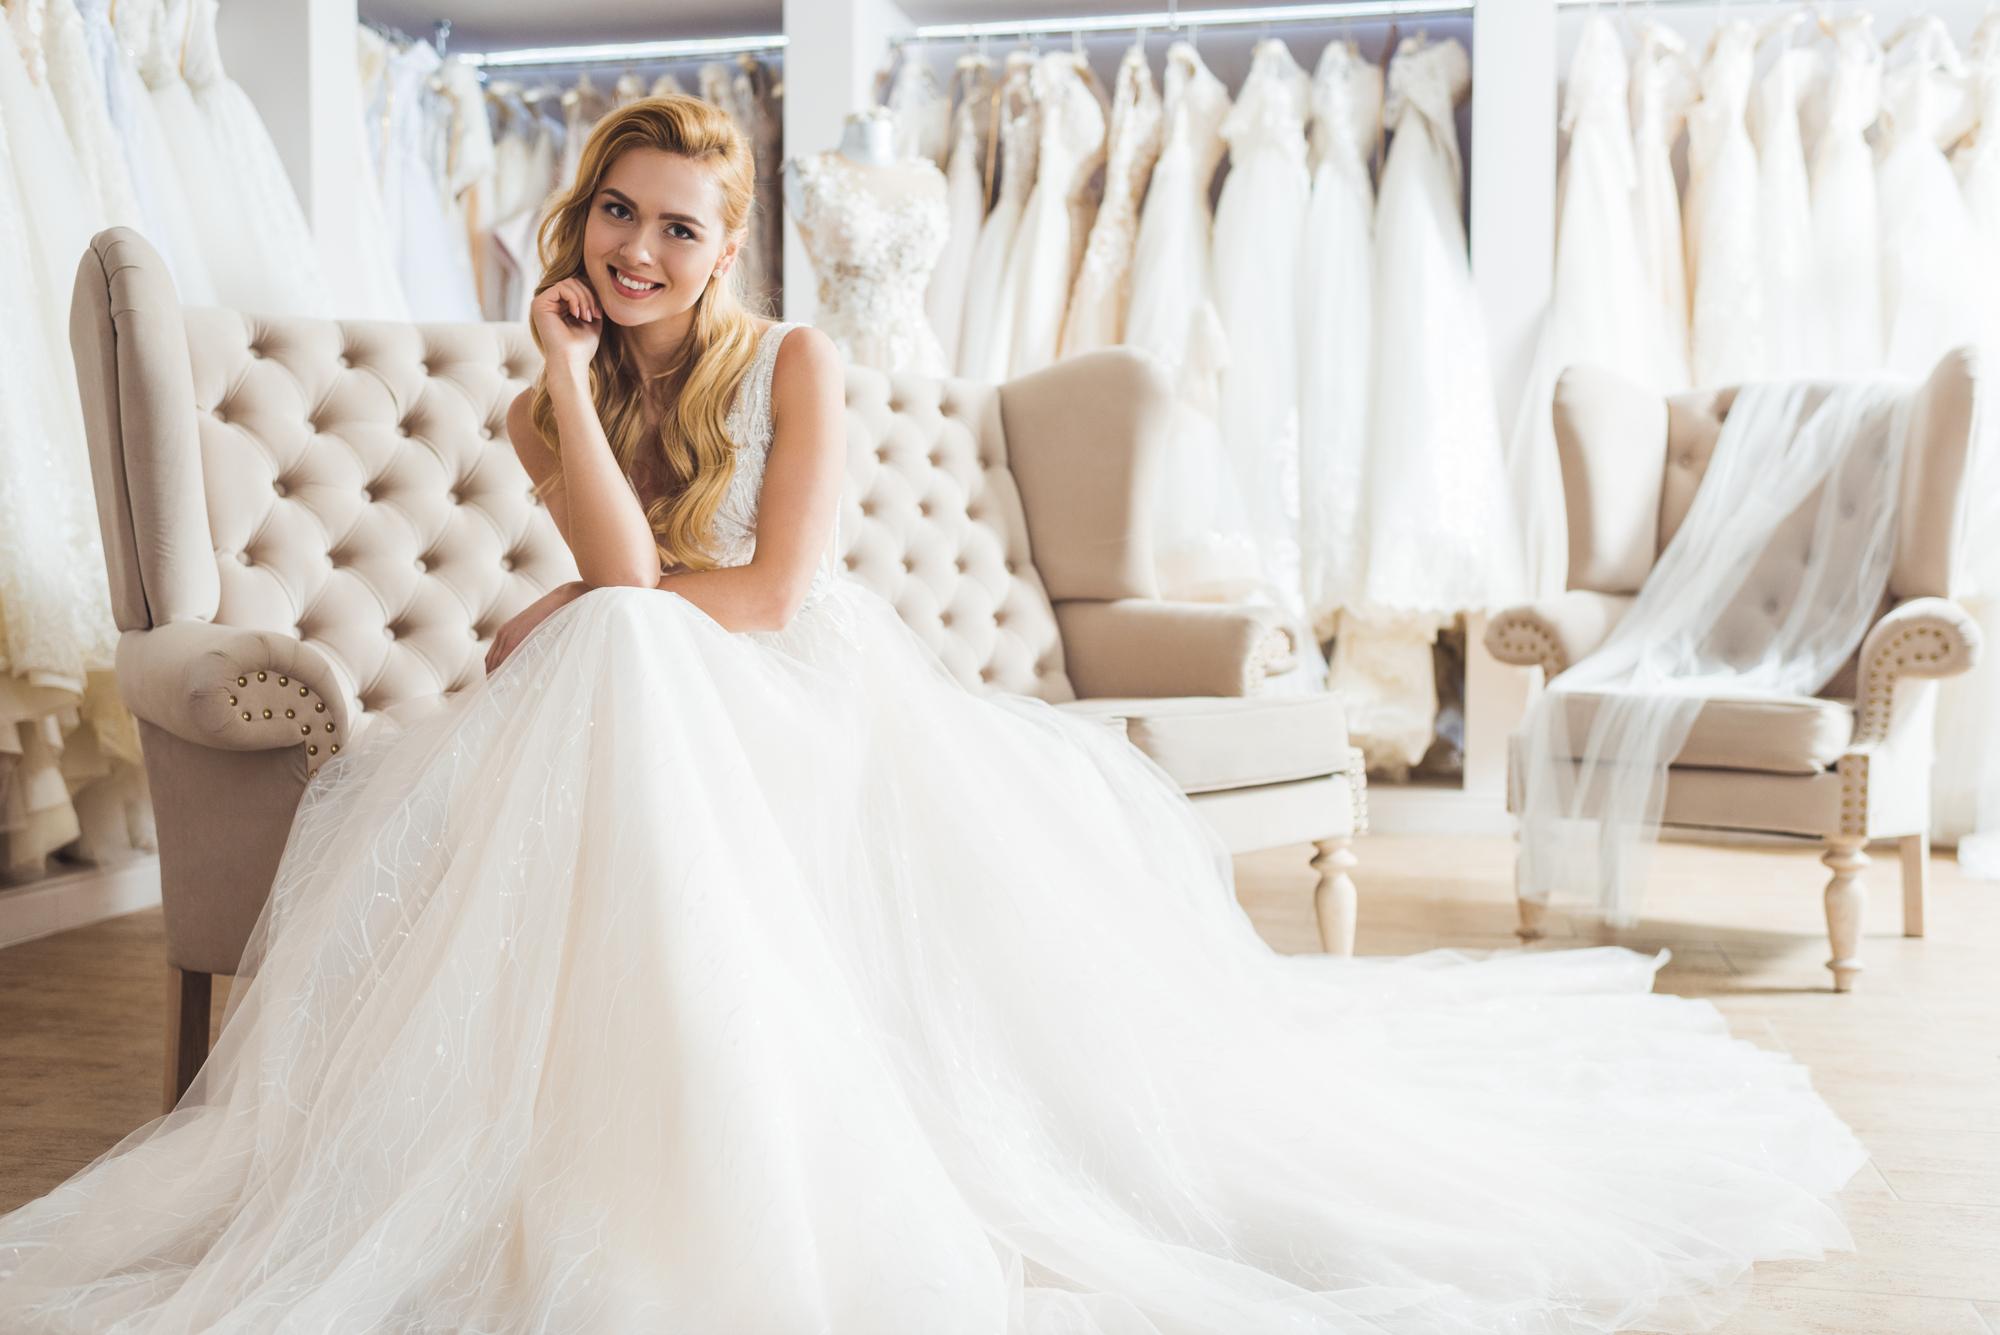 4 Reasons to Choose a Sample Wedding Dress